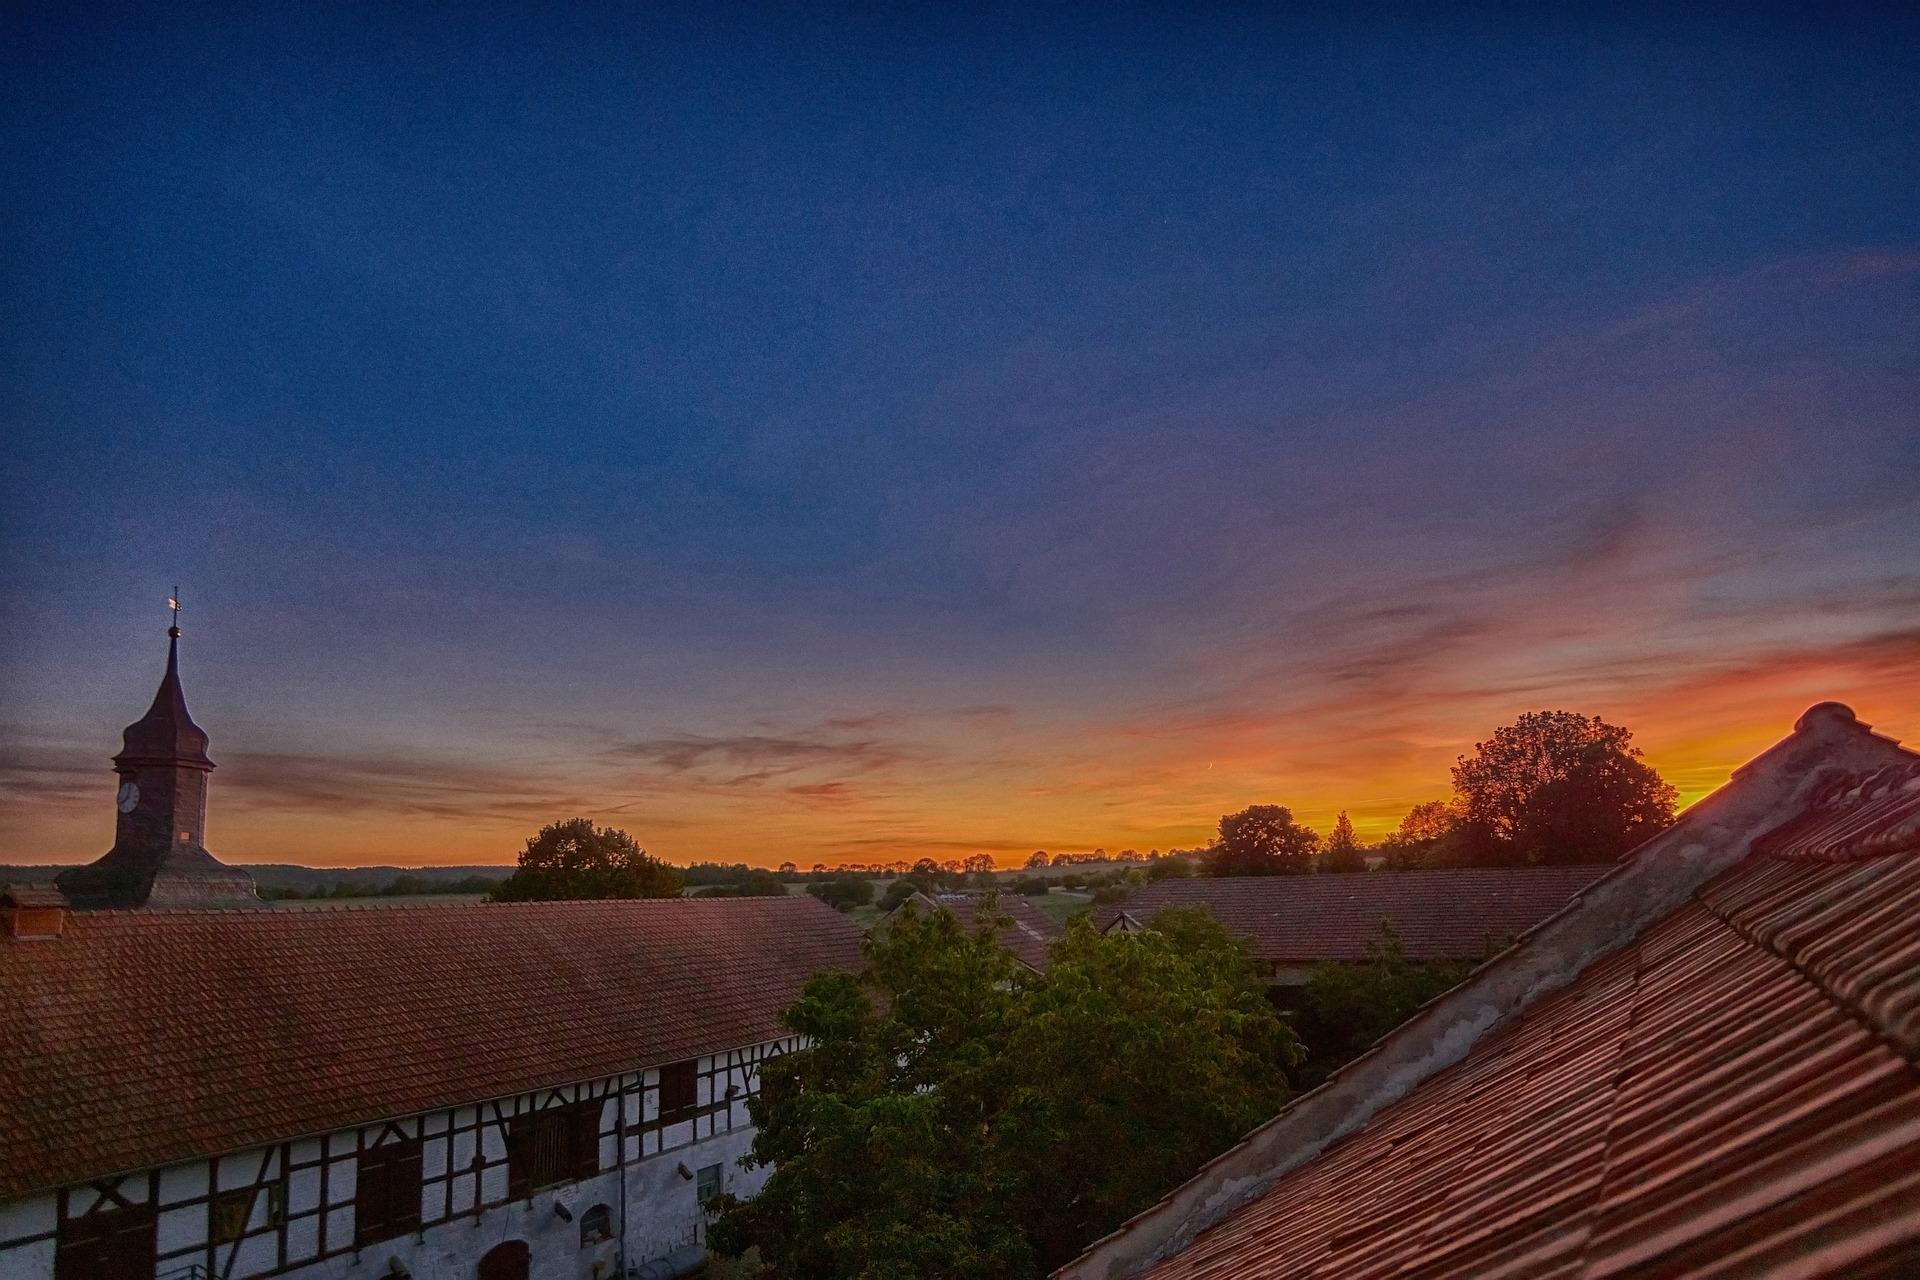 Sonnenuntergang auf den Dächern in Drößnitz